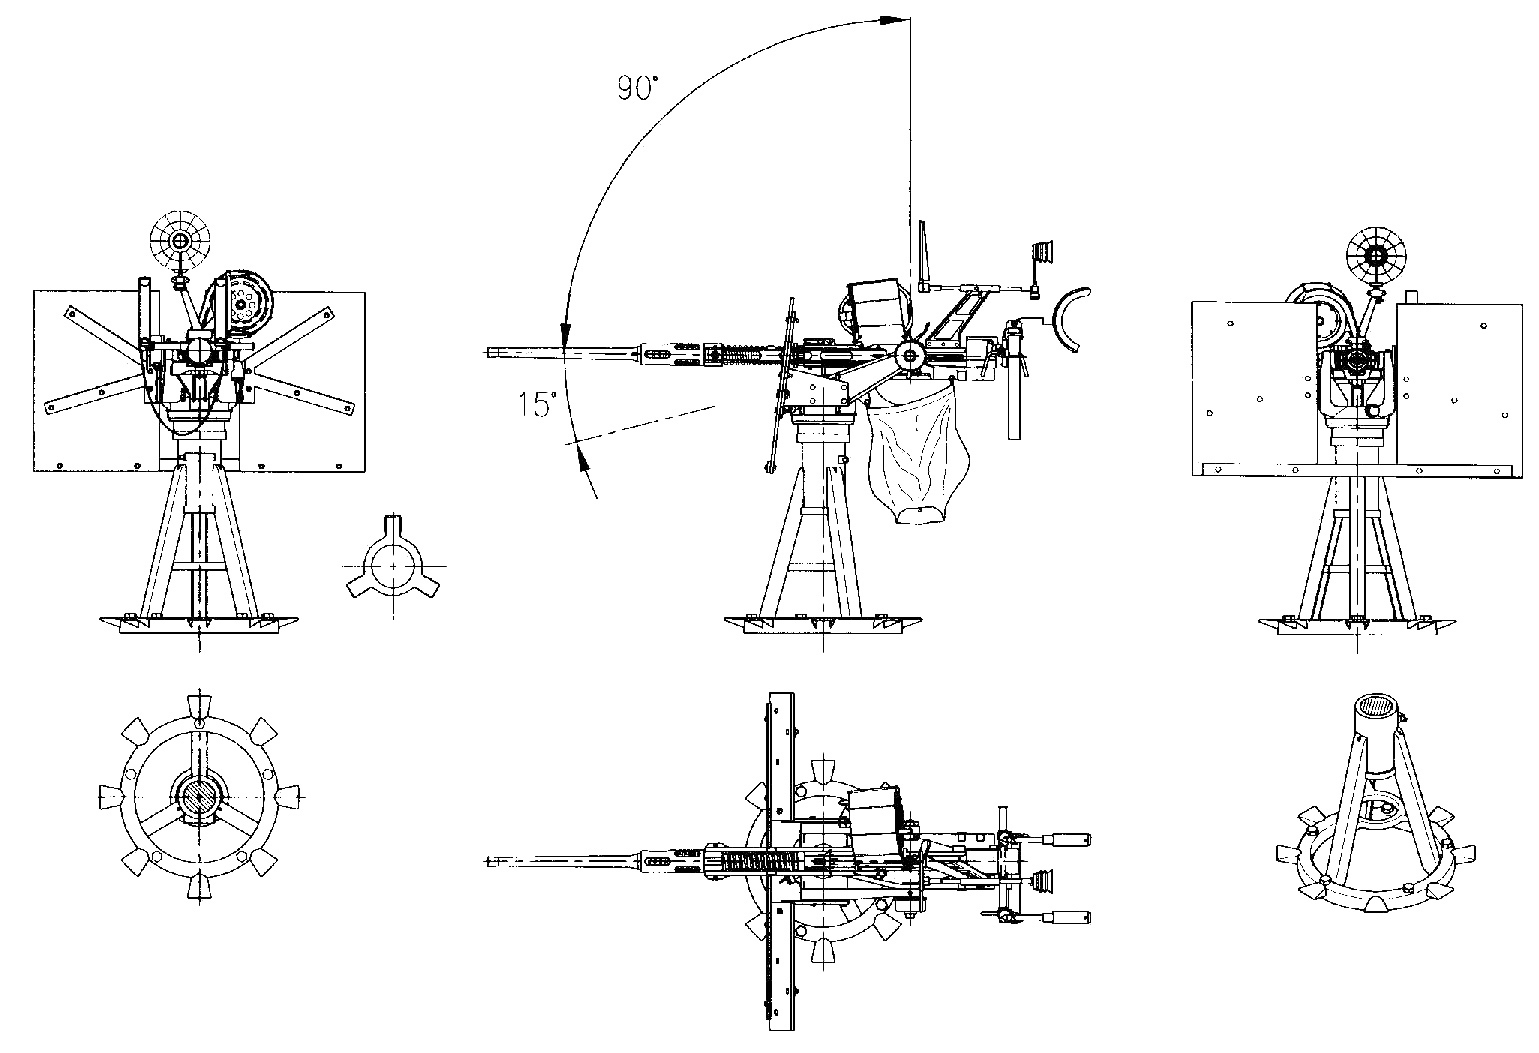 Oerlikon 20 mm cannon blueprint